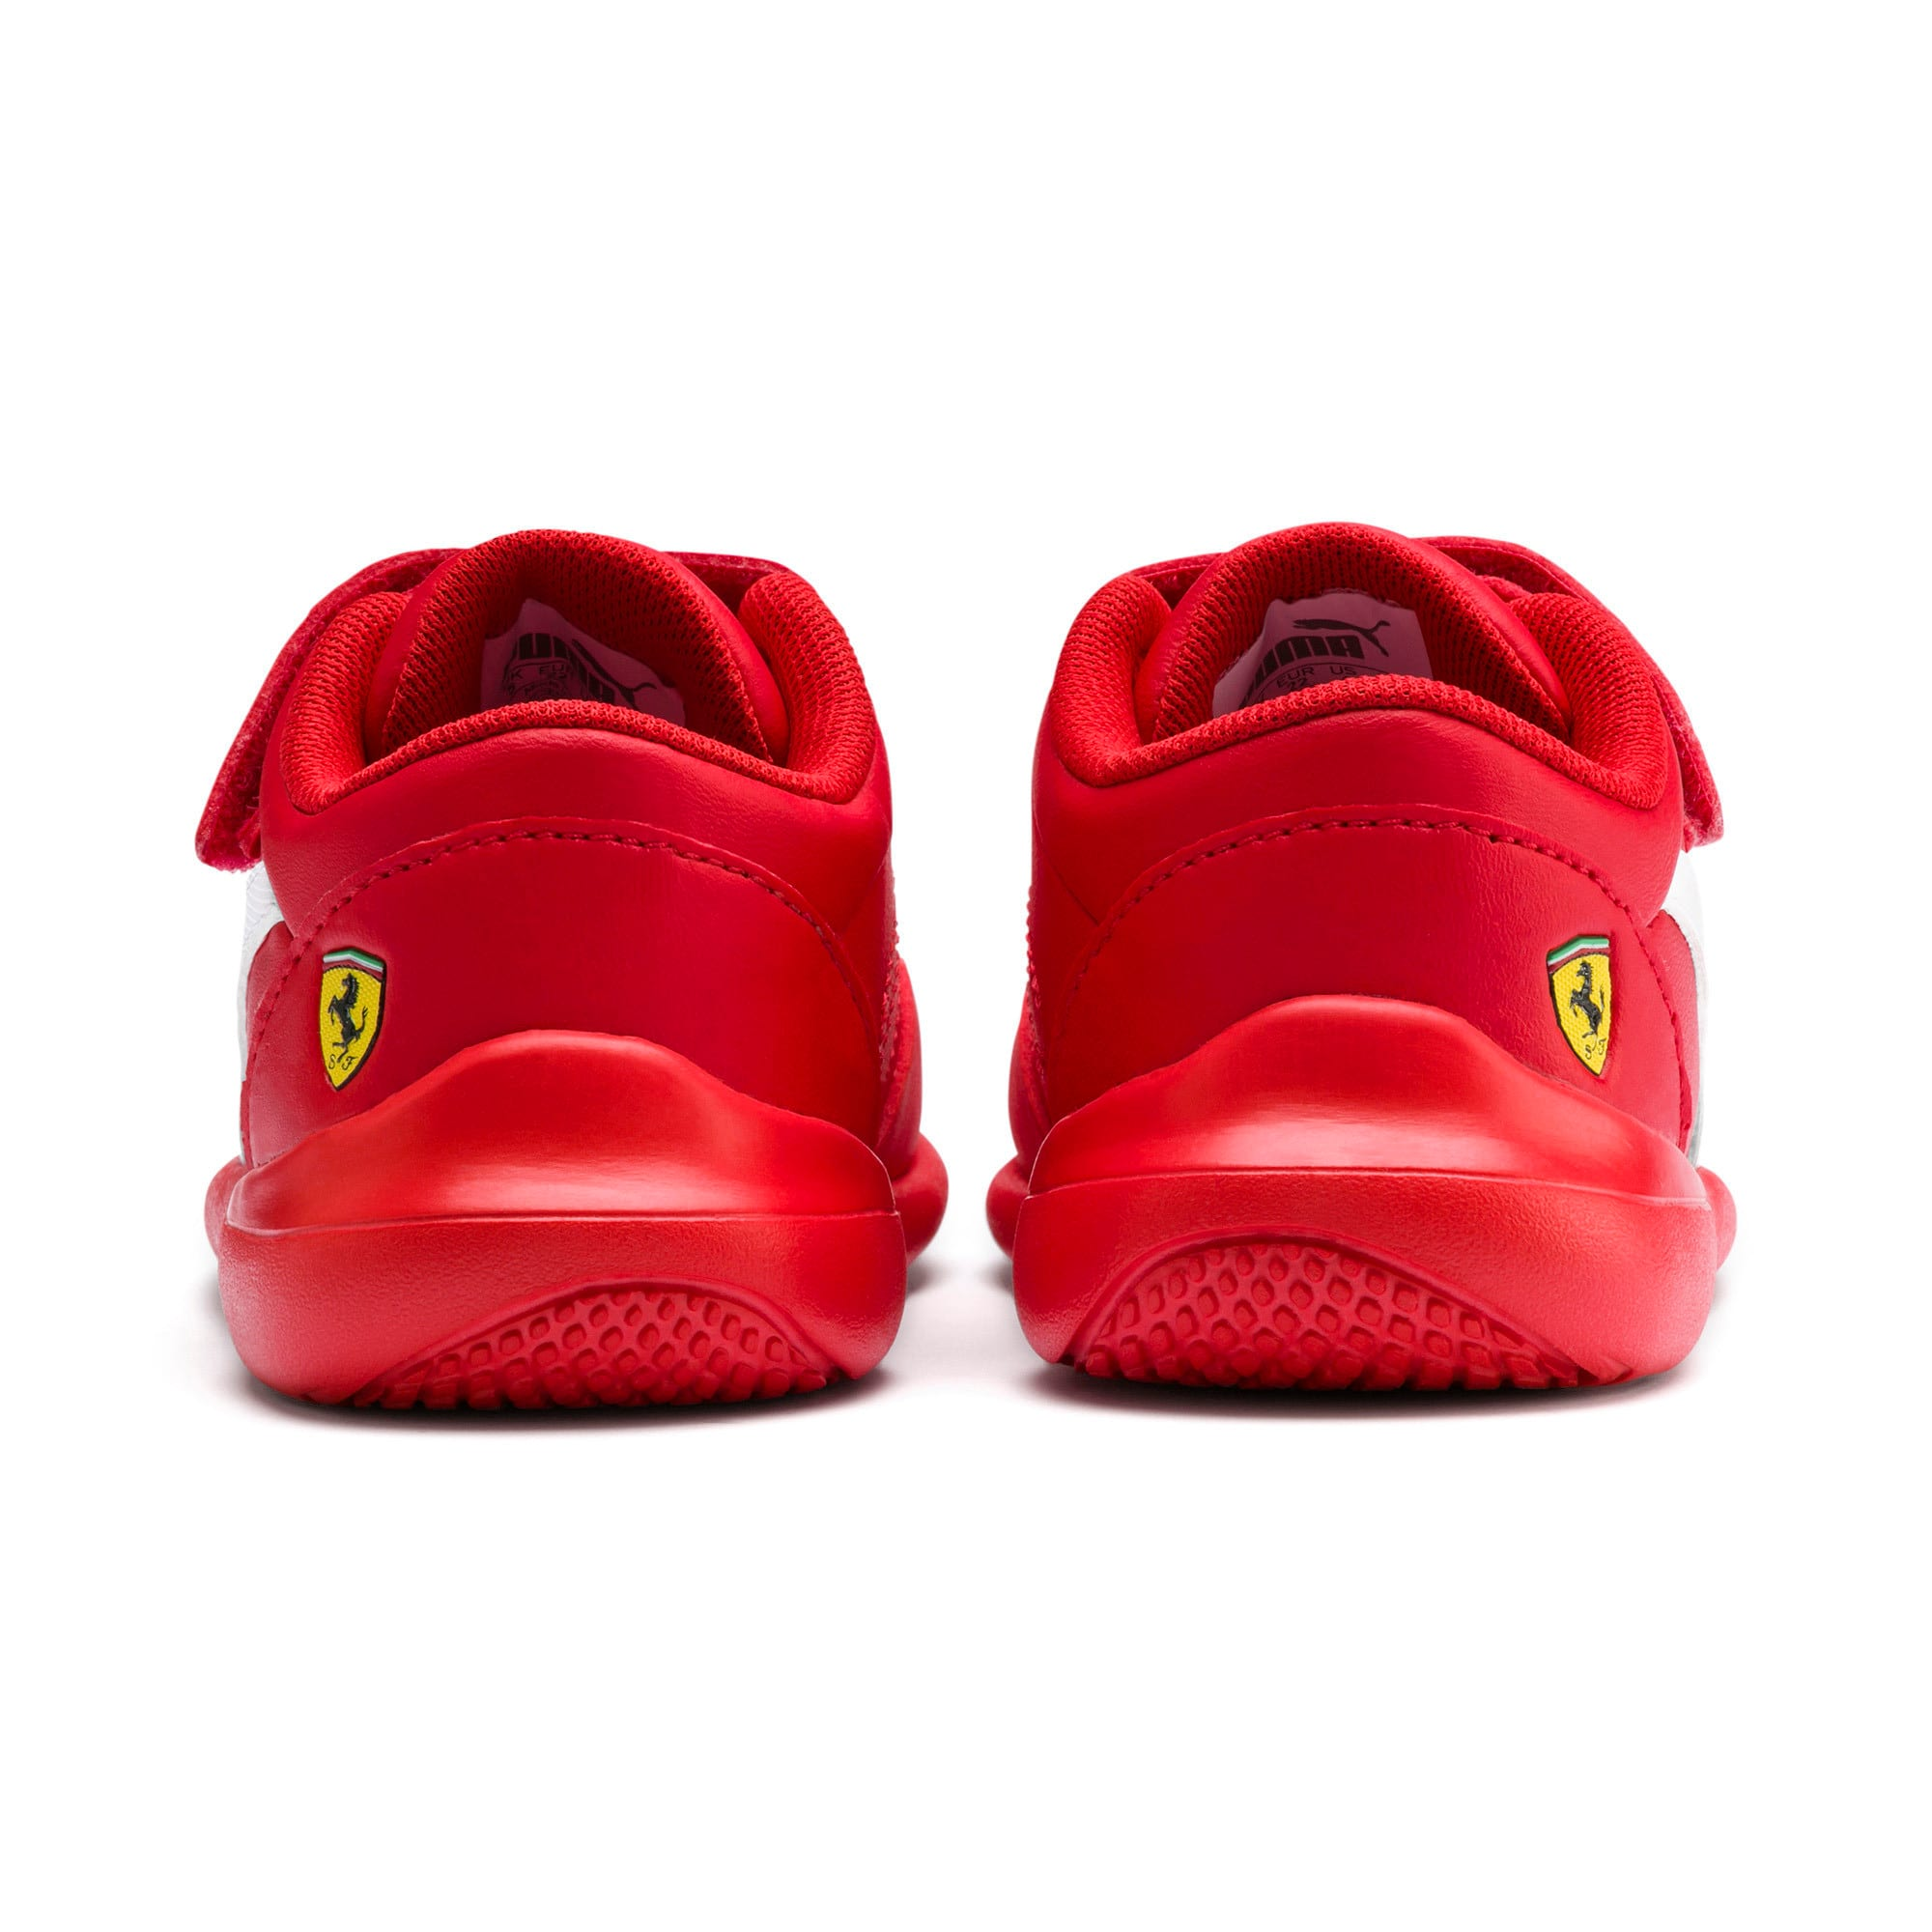 Miniatura 3 de Zapatos Scuderia Ferrari Kart Cat III para bebés, Rosso Corsa-Wht-Rosso Corsa, mediano